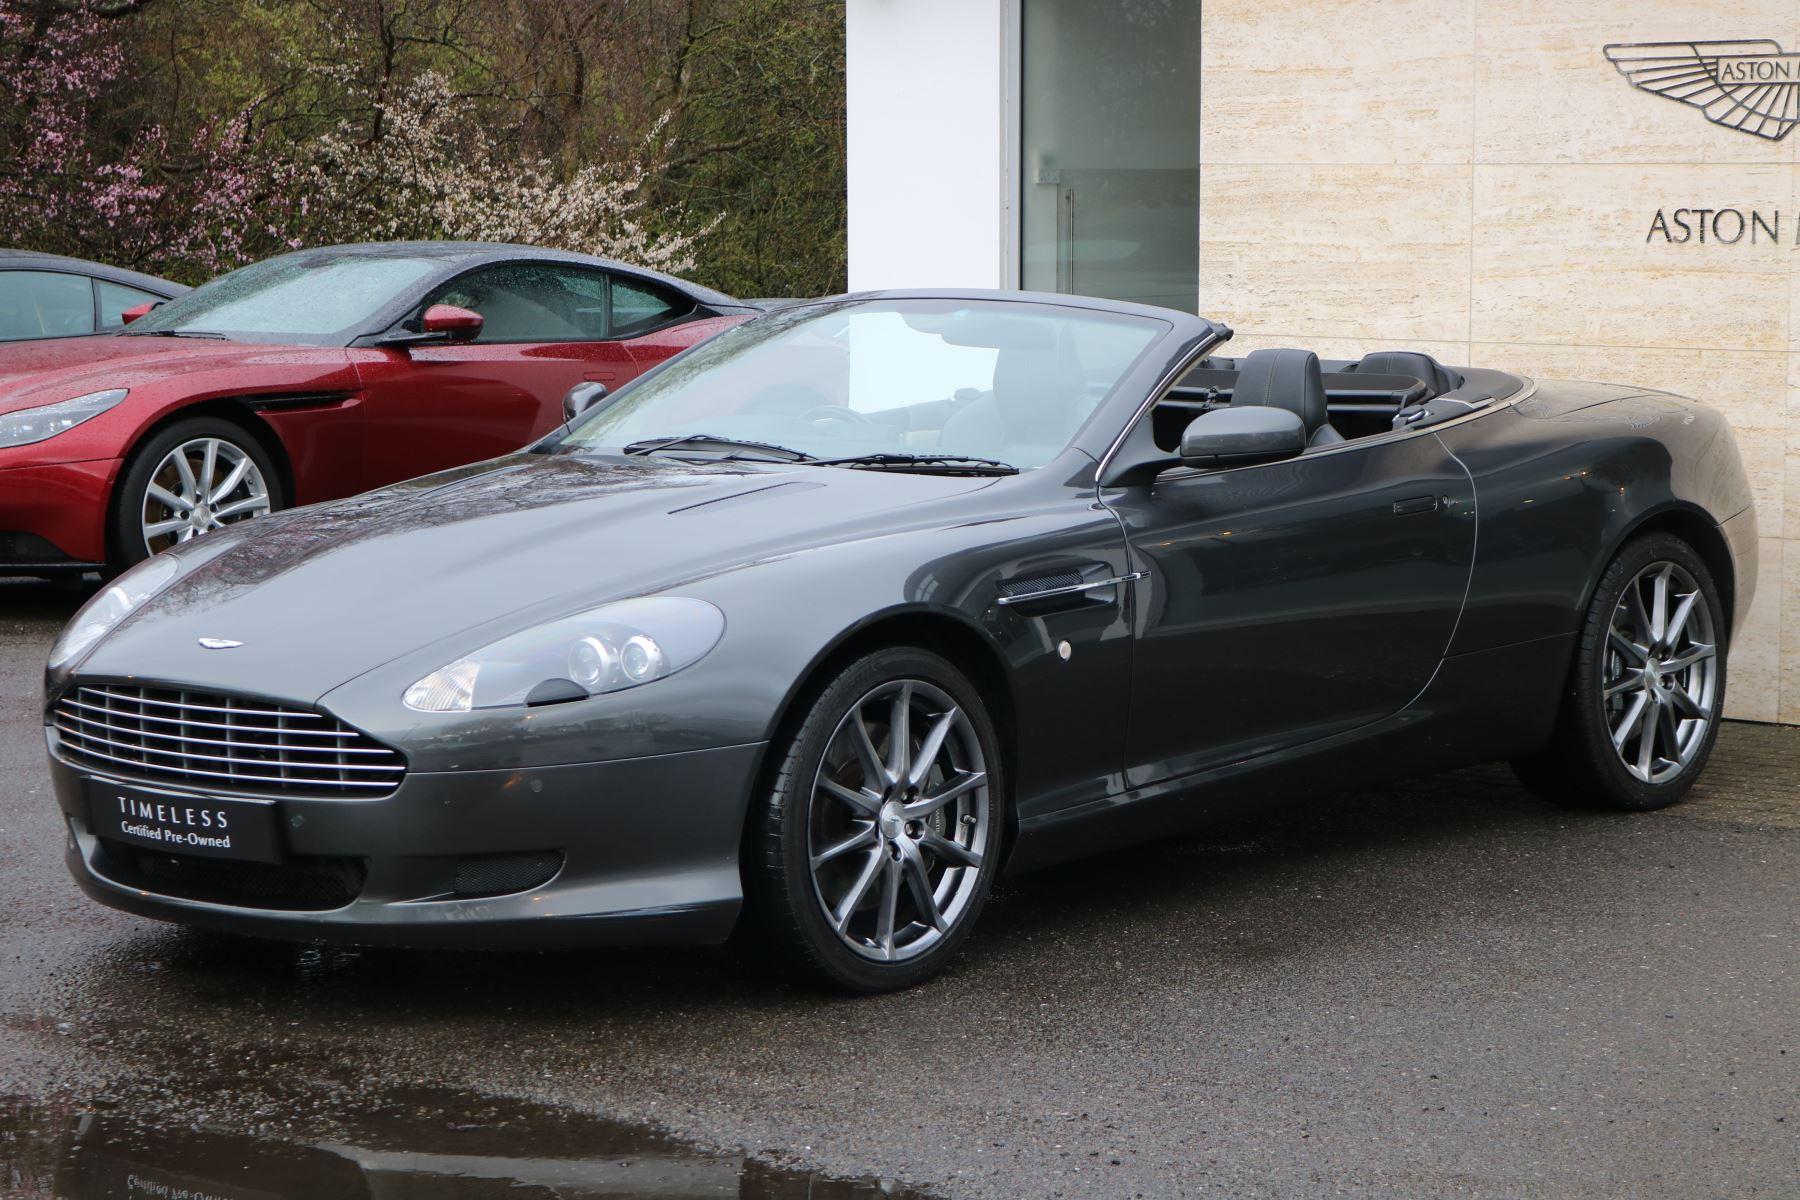 Aston Martin DB9 V12 2dr Volante Touchtronic [470] 5.9 Automatic Convertible (2009) image